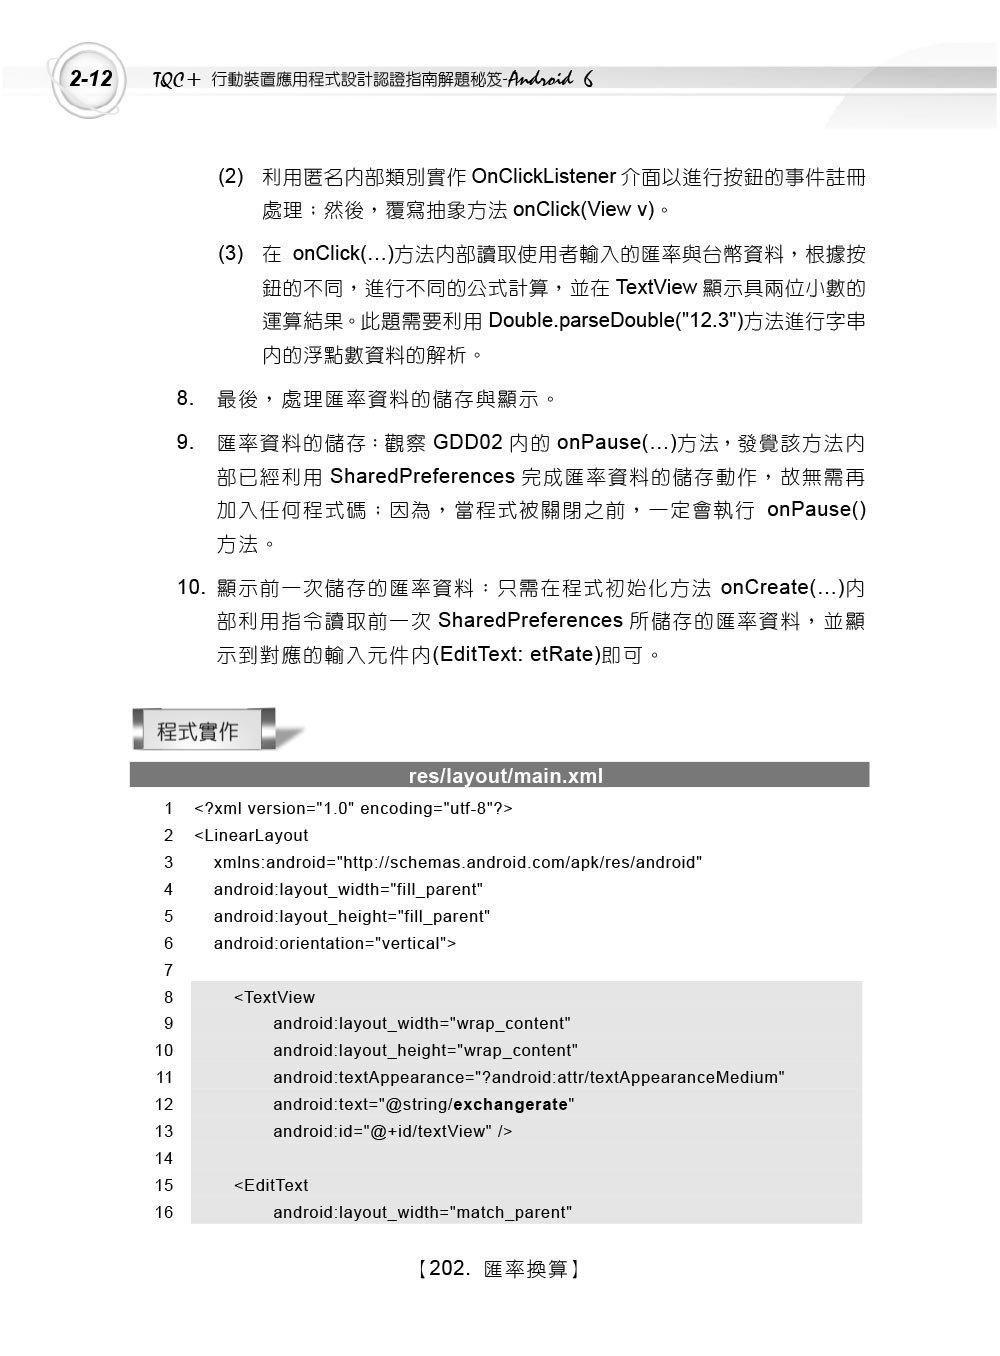 TQC+ 行動裝置應用程式設計認證指南解題秘笈 -- Android 6-preview-9